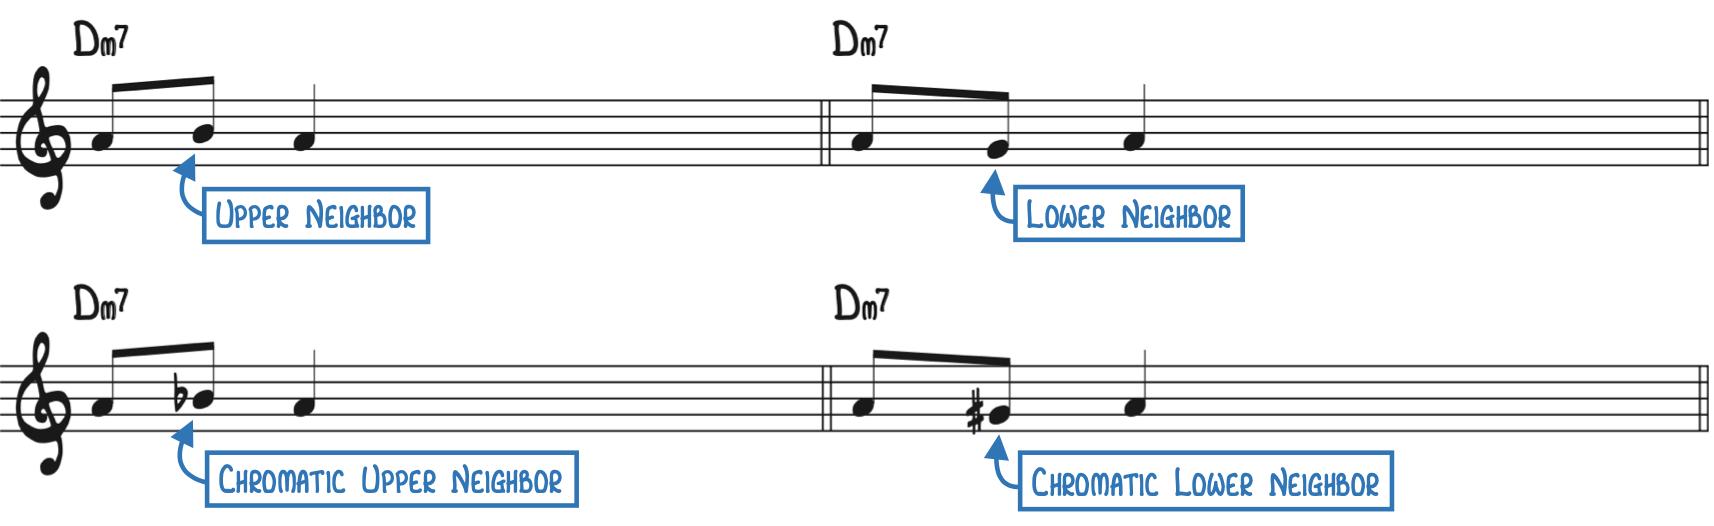 Neighbor Notes to play bebop piano